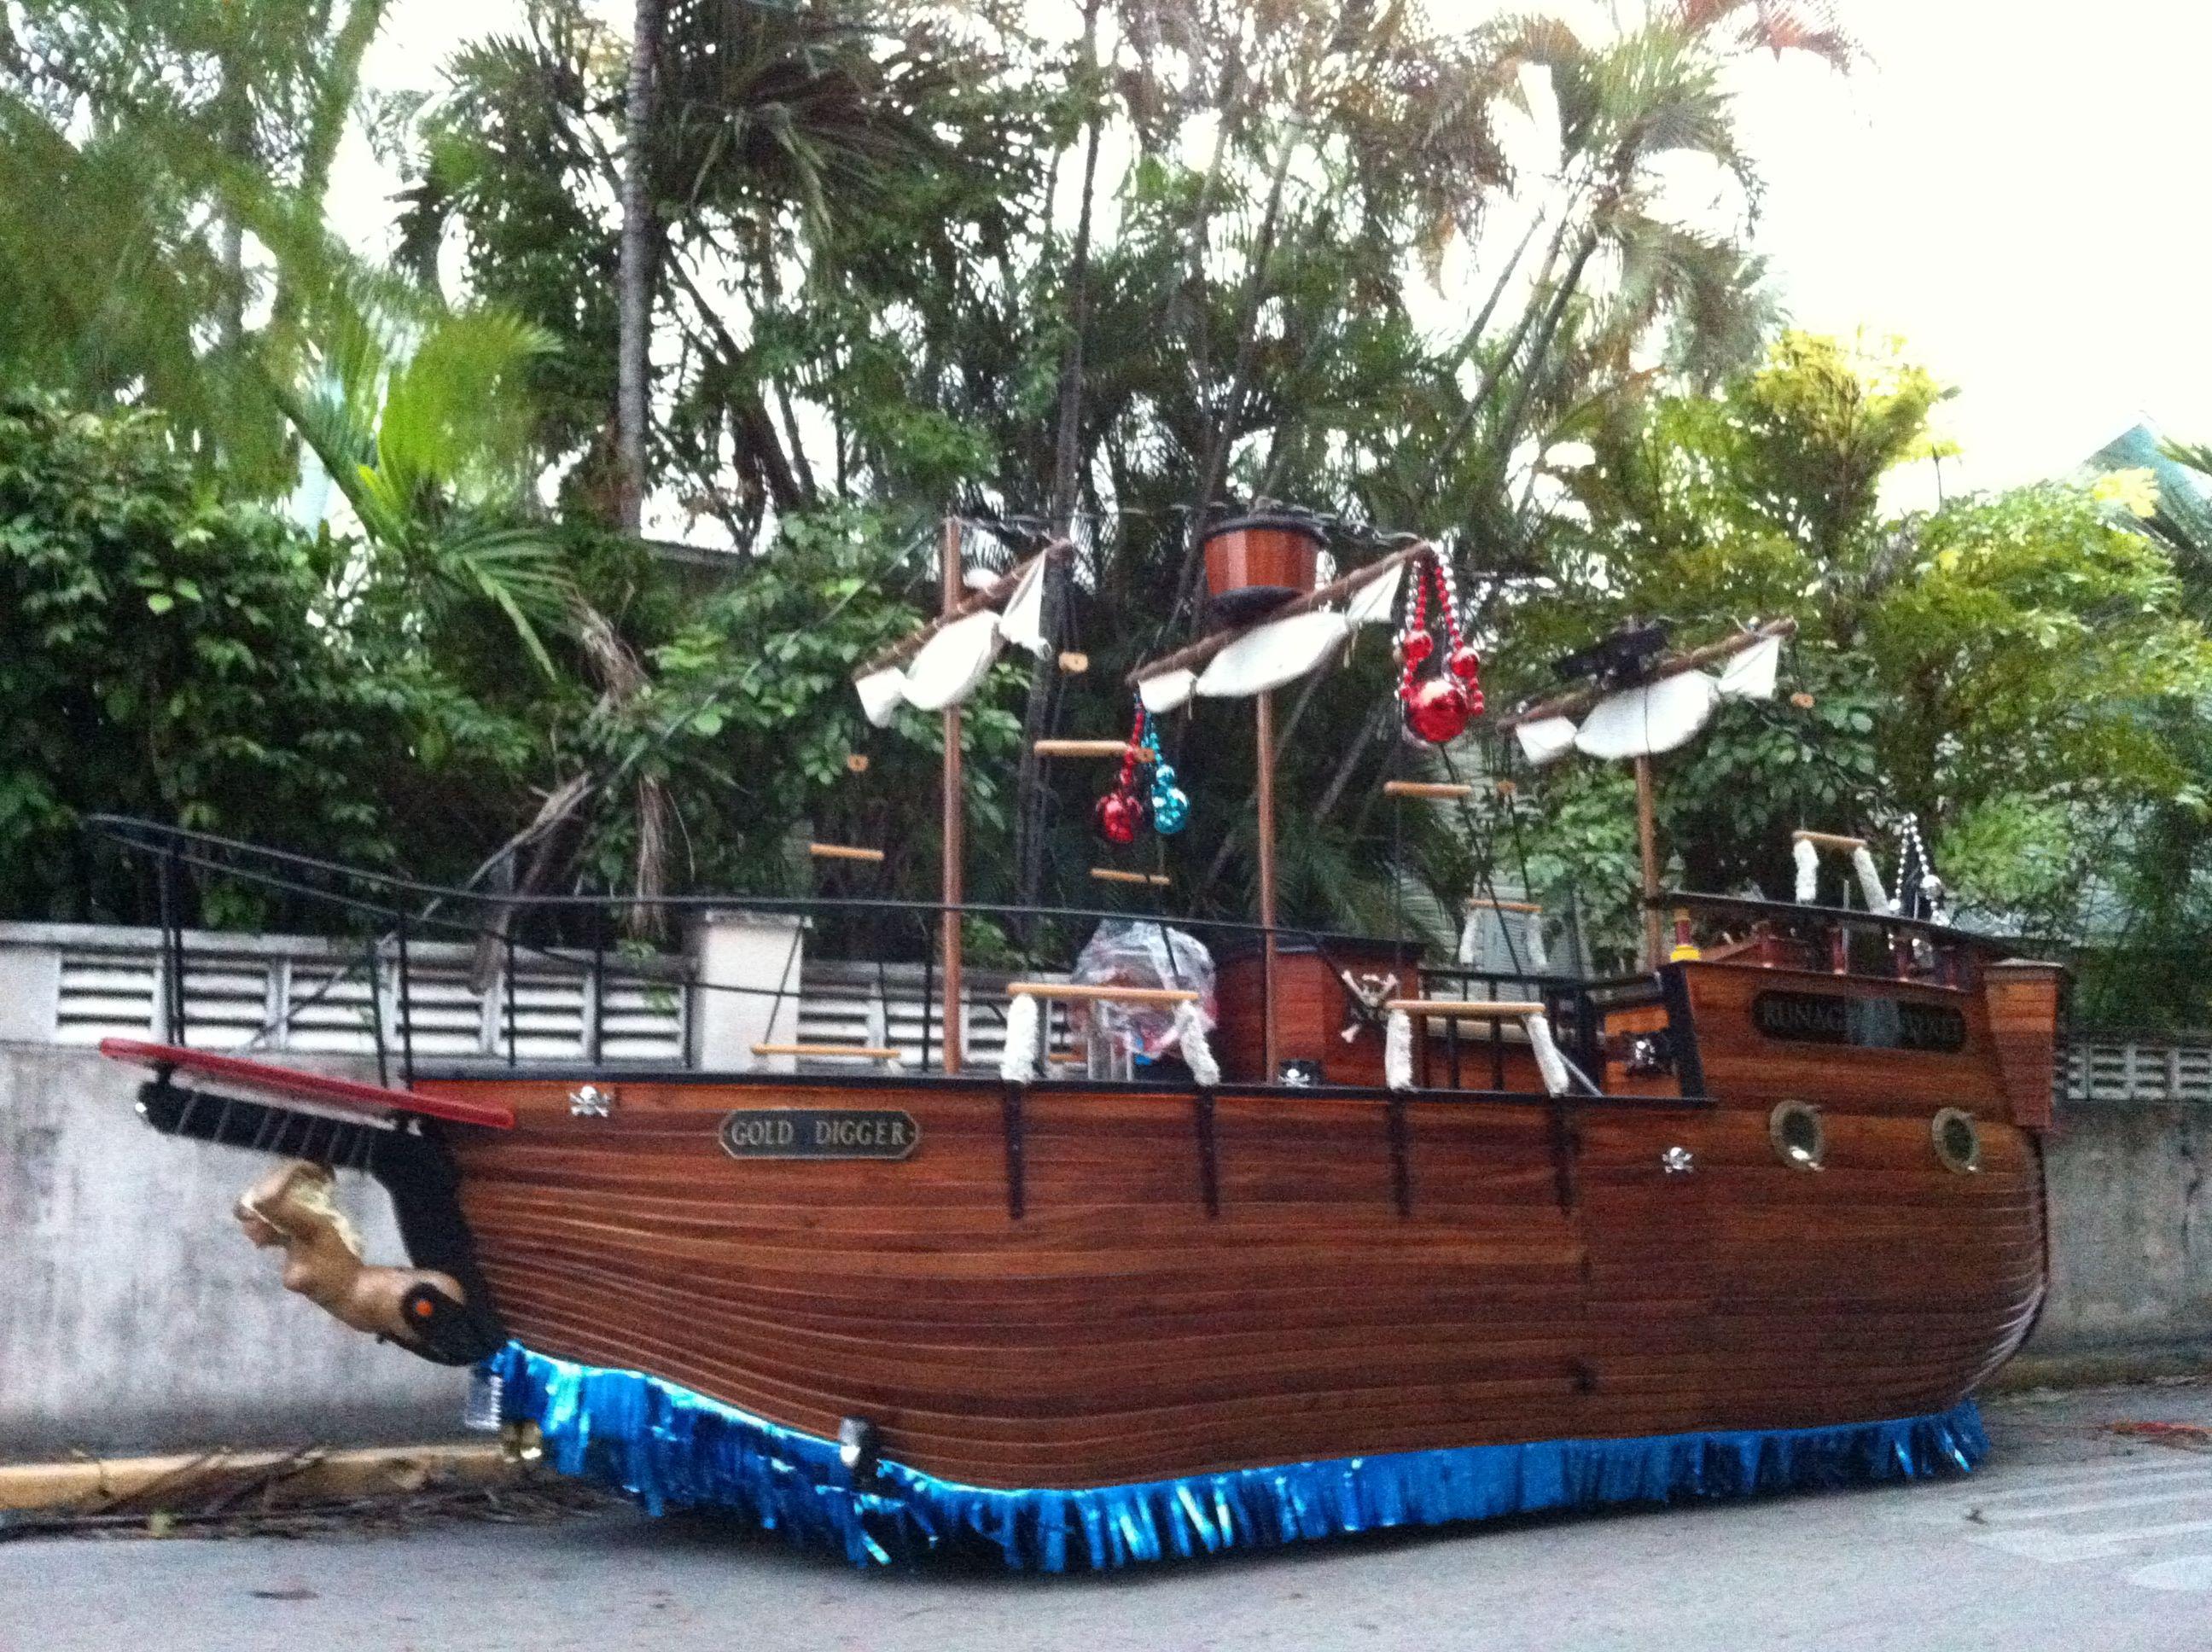 Pirate ship on parade | Pirate | Pinterest | Pirate ships ...